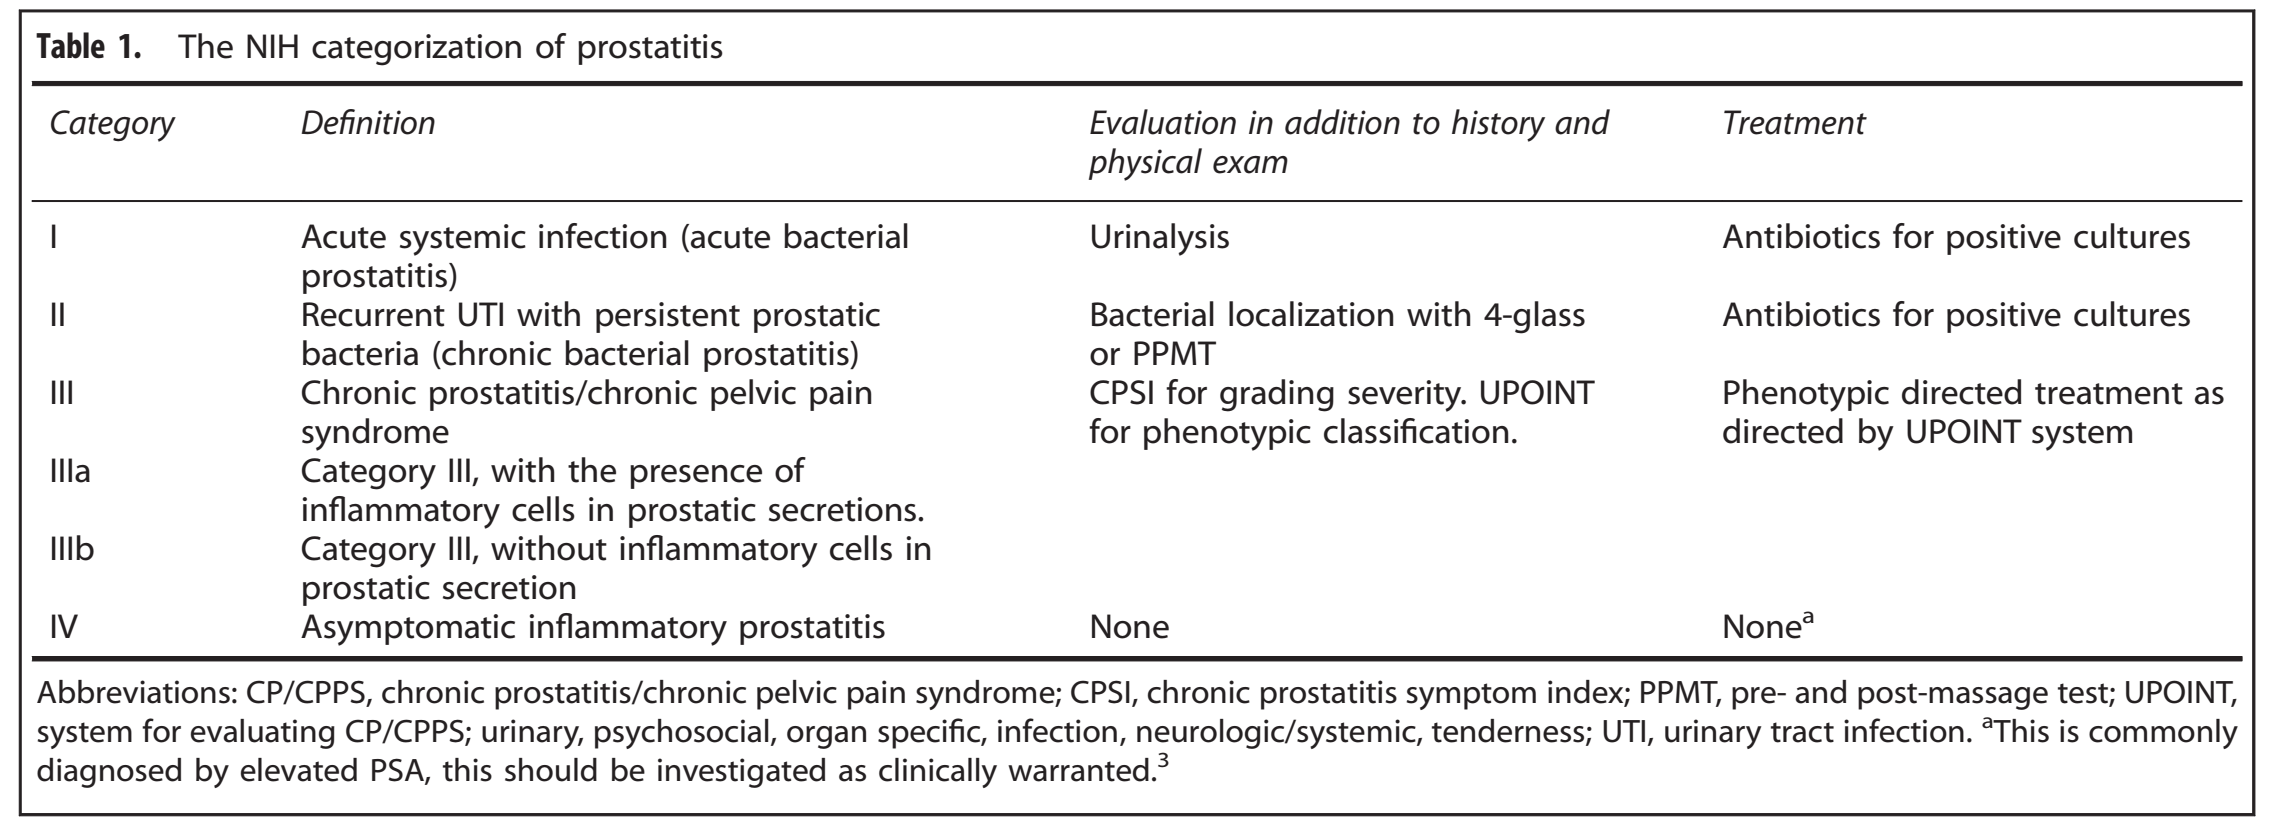 síntomas de una prostatitis crónica e